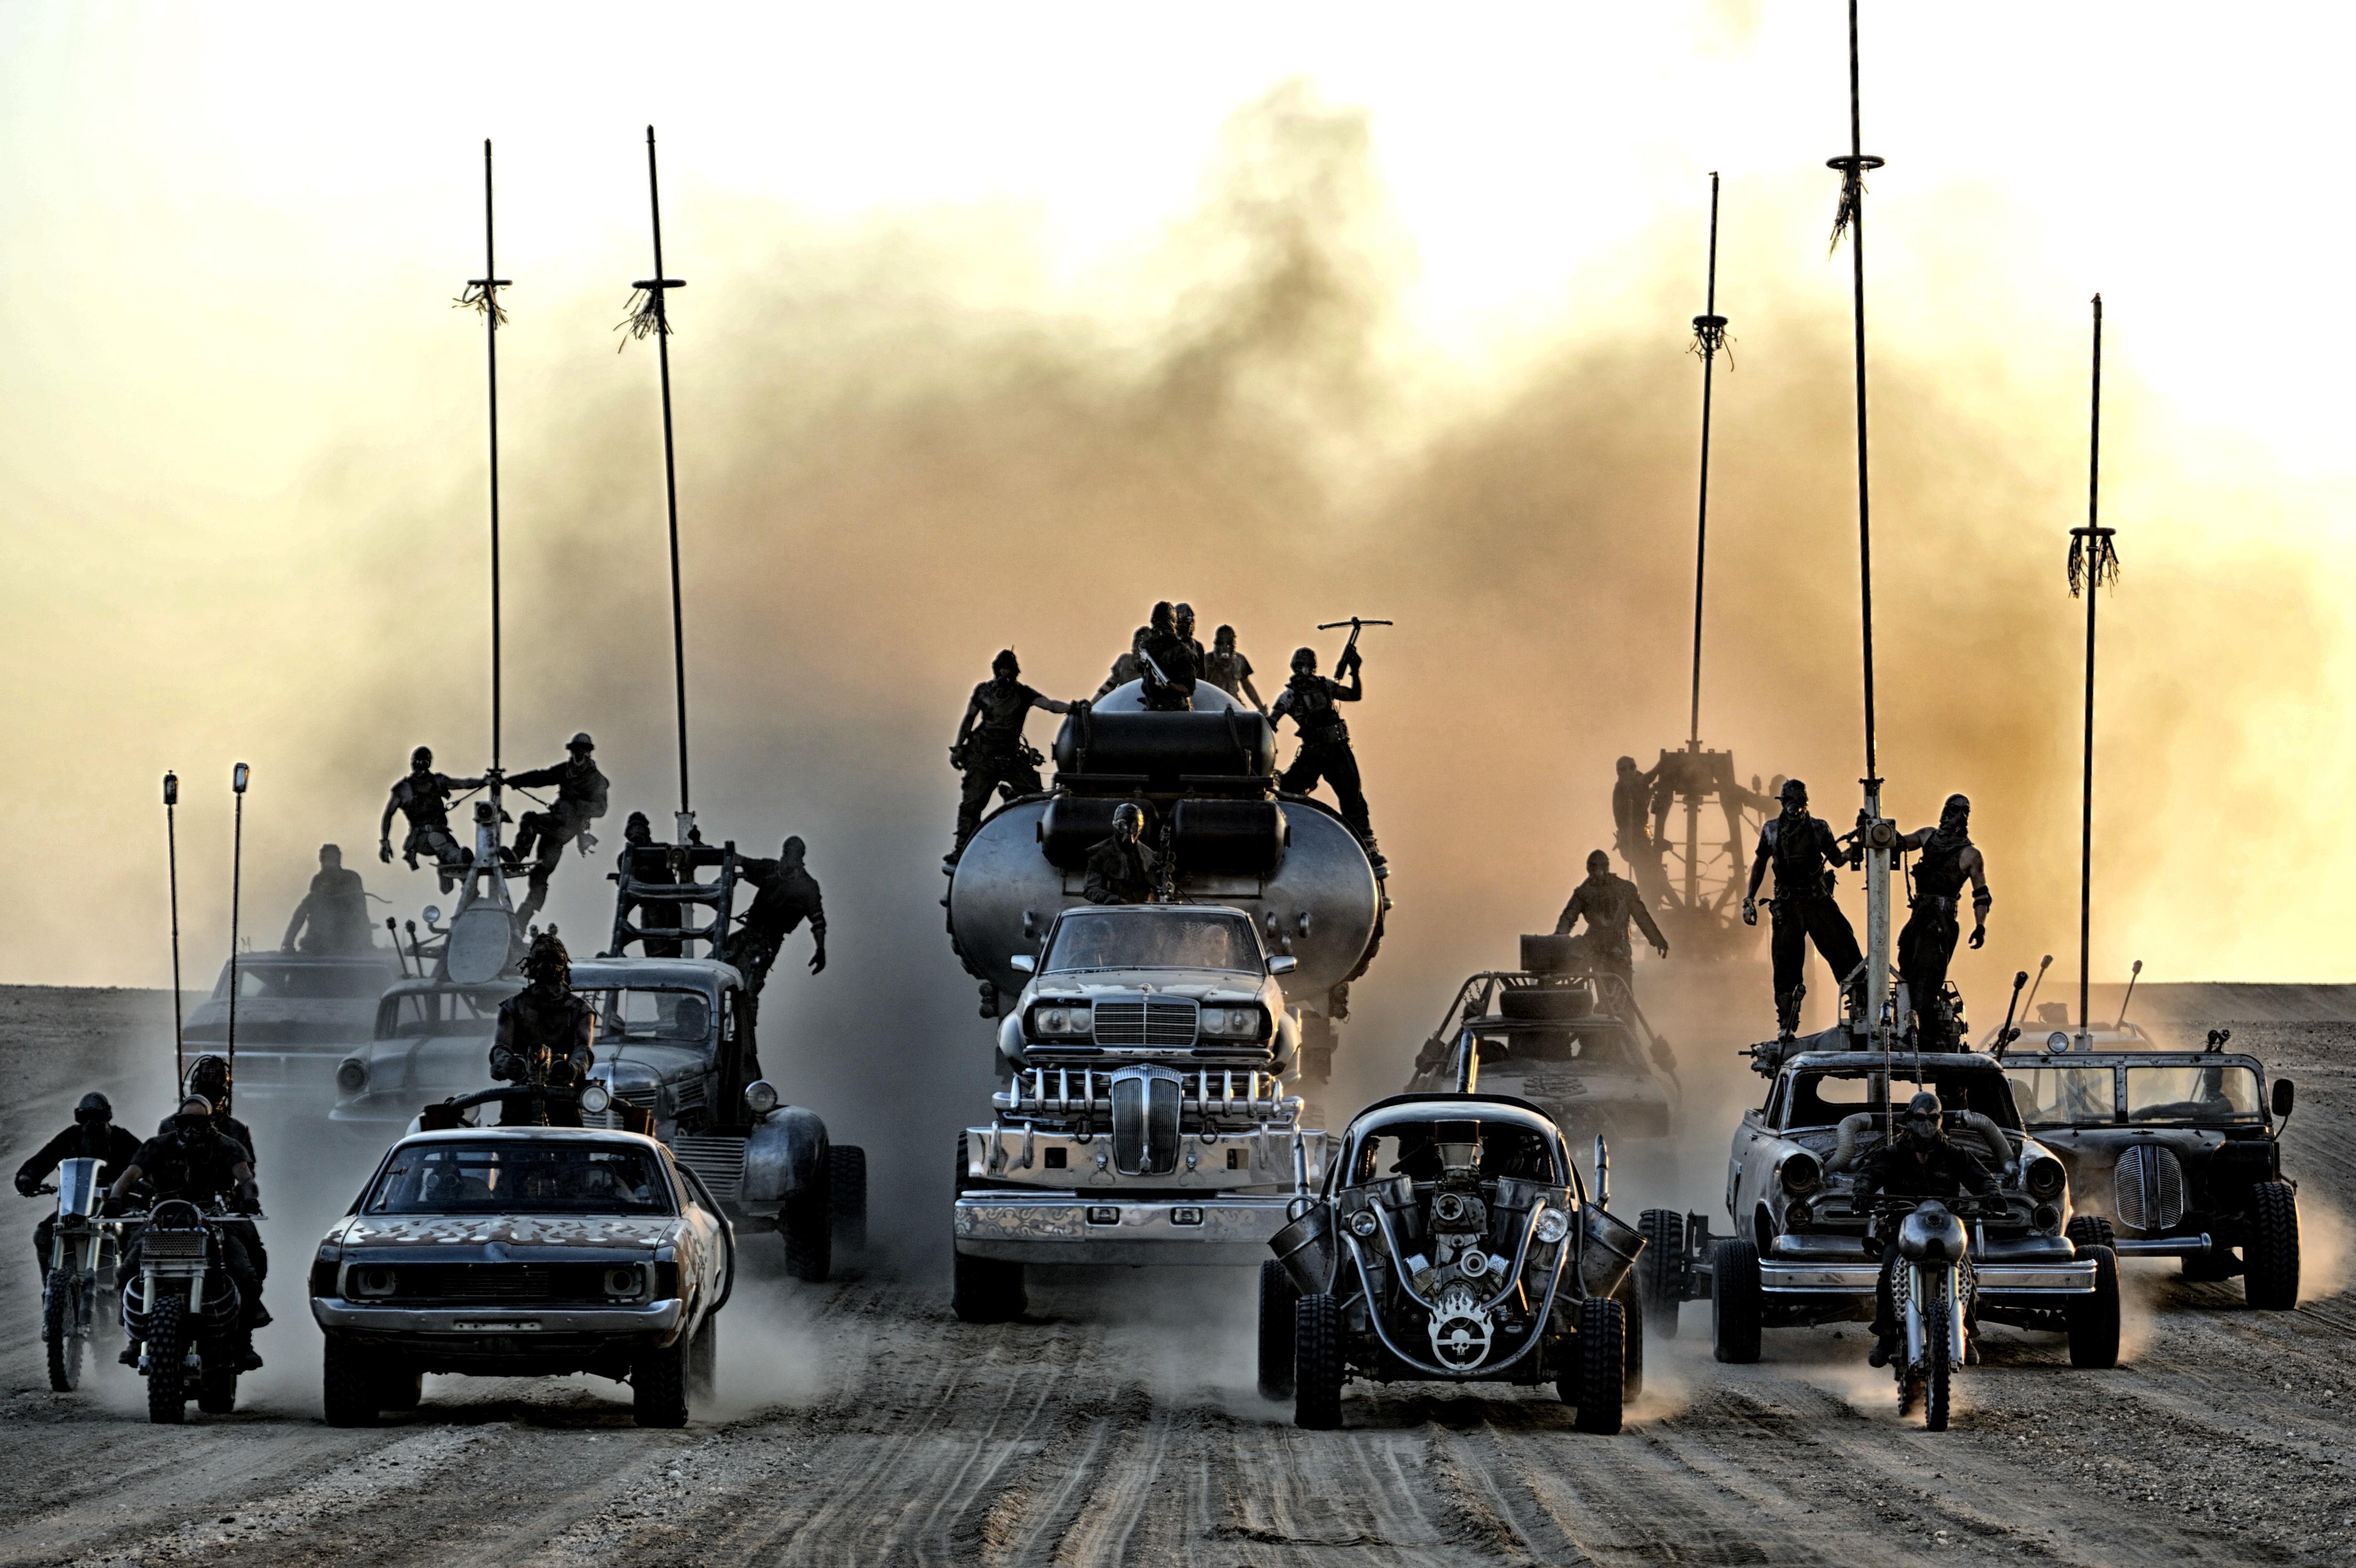 4928x3280 px Mad Max Fury Road movies